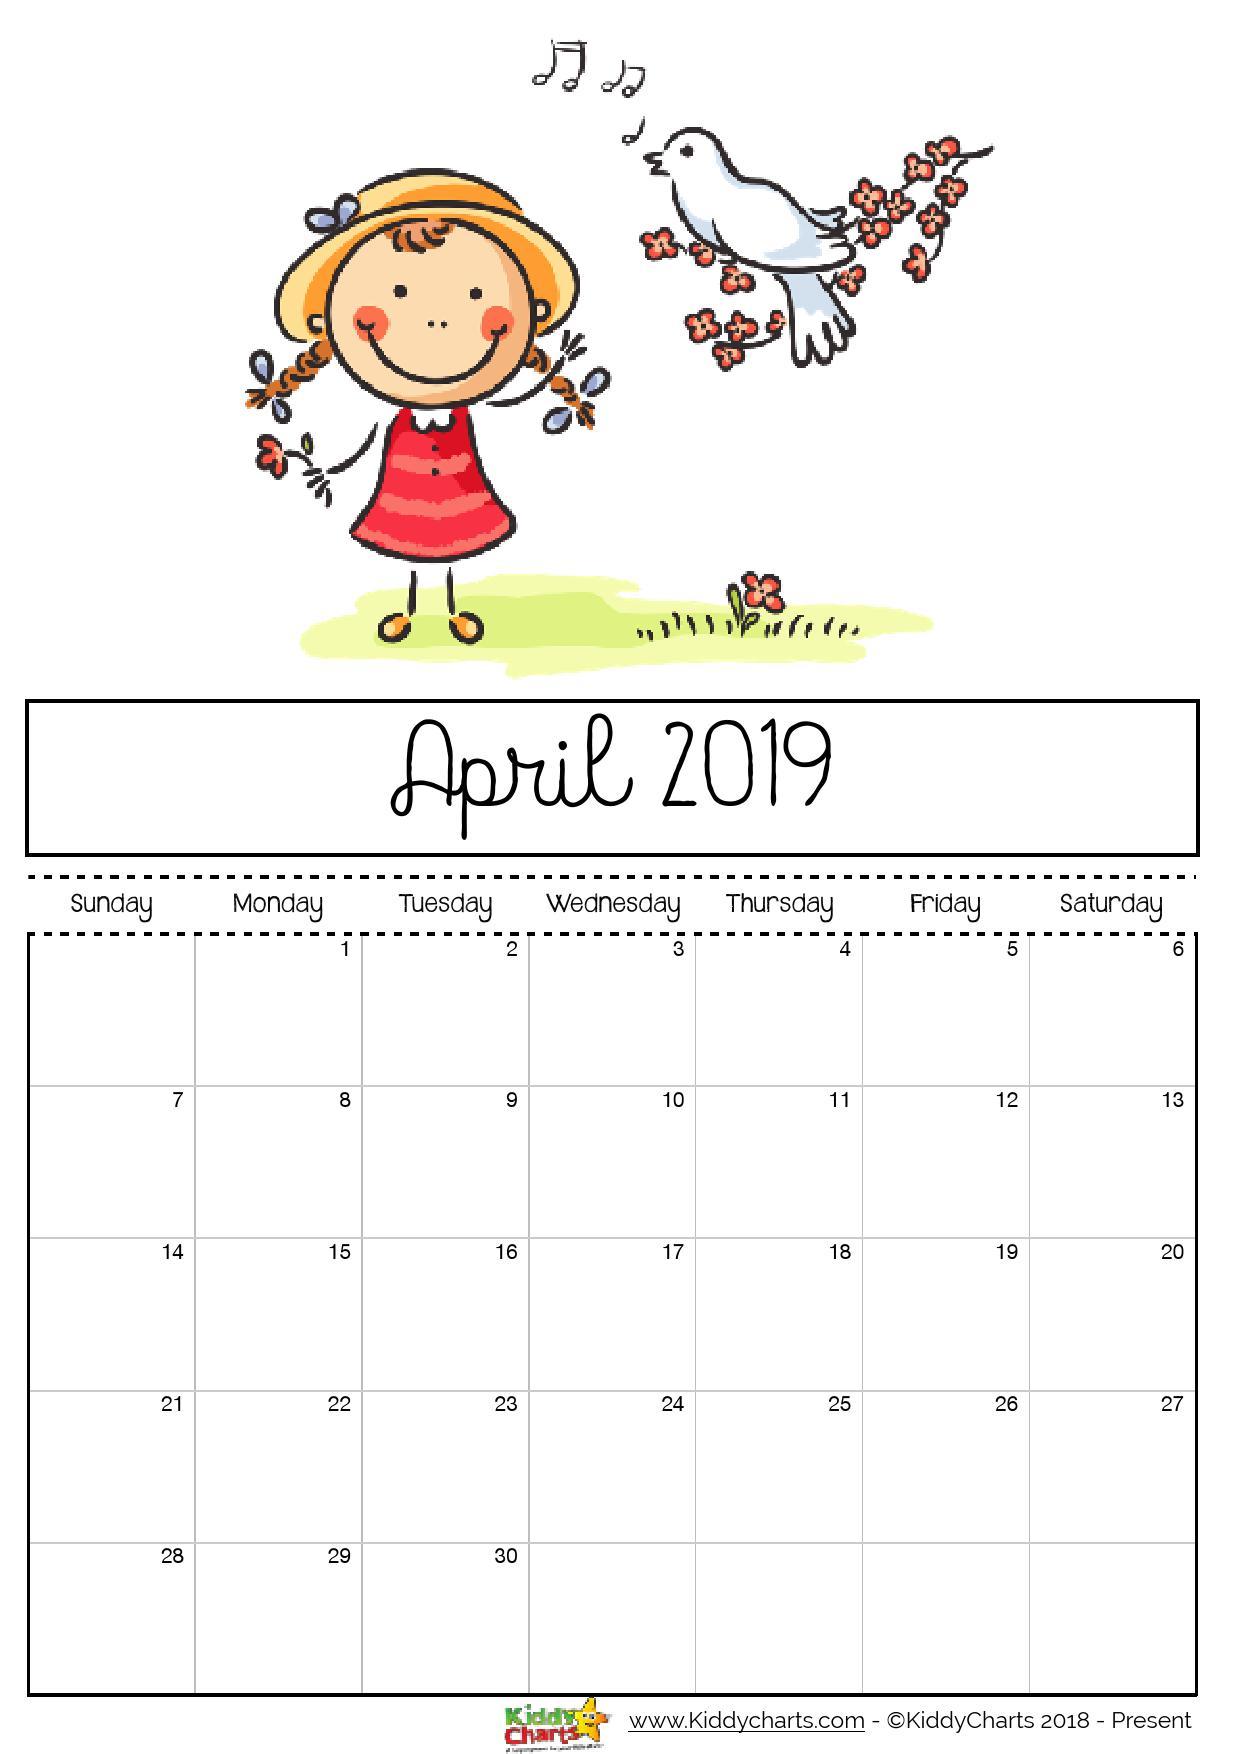 April printable 2019 calendar sheet - dove singing to a little girl. Cute isn't it? #Printable #2019calendar #kidsprintables